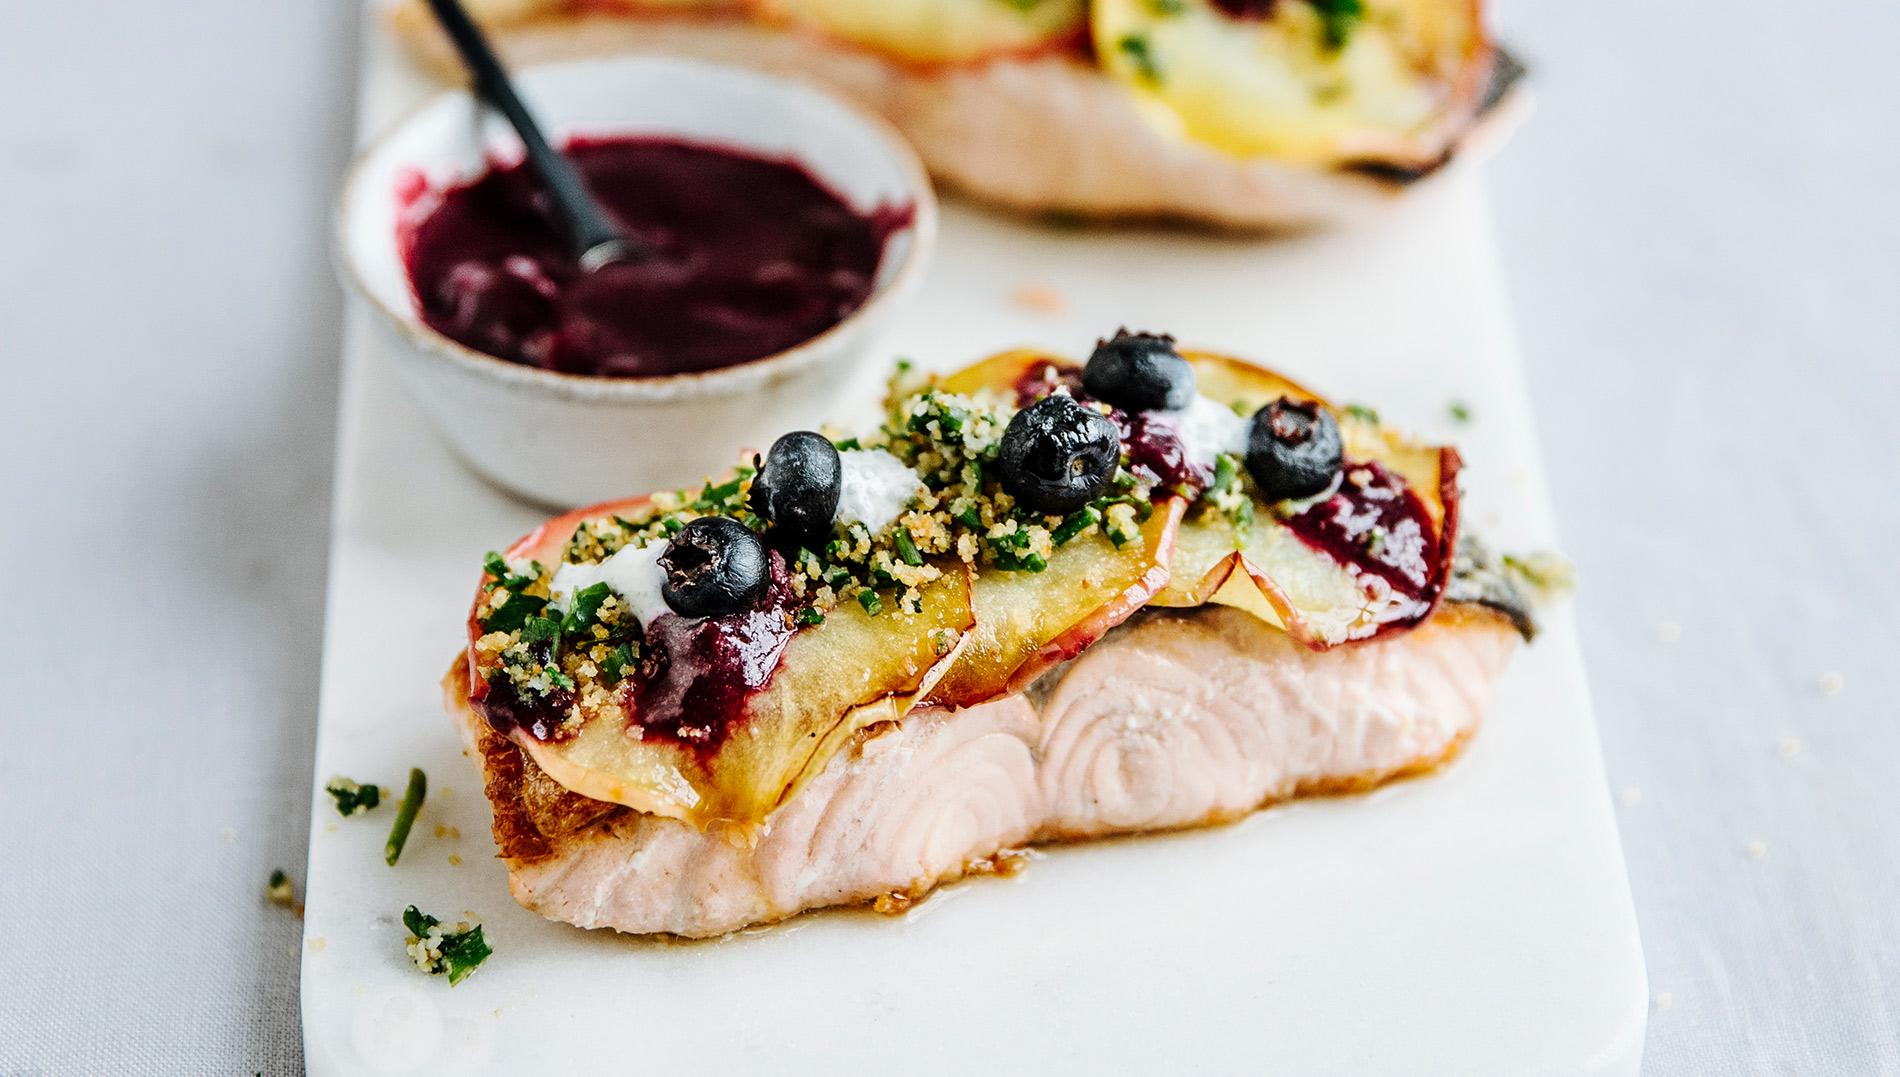 FINESSE, Gourmet, Food, Magazin, Rezepte, Fisch, Apfelglück, Lachsfilet, Blaubeeren, Kräutertopping